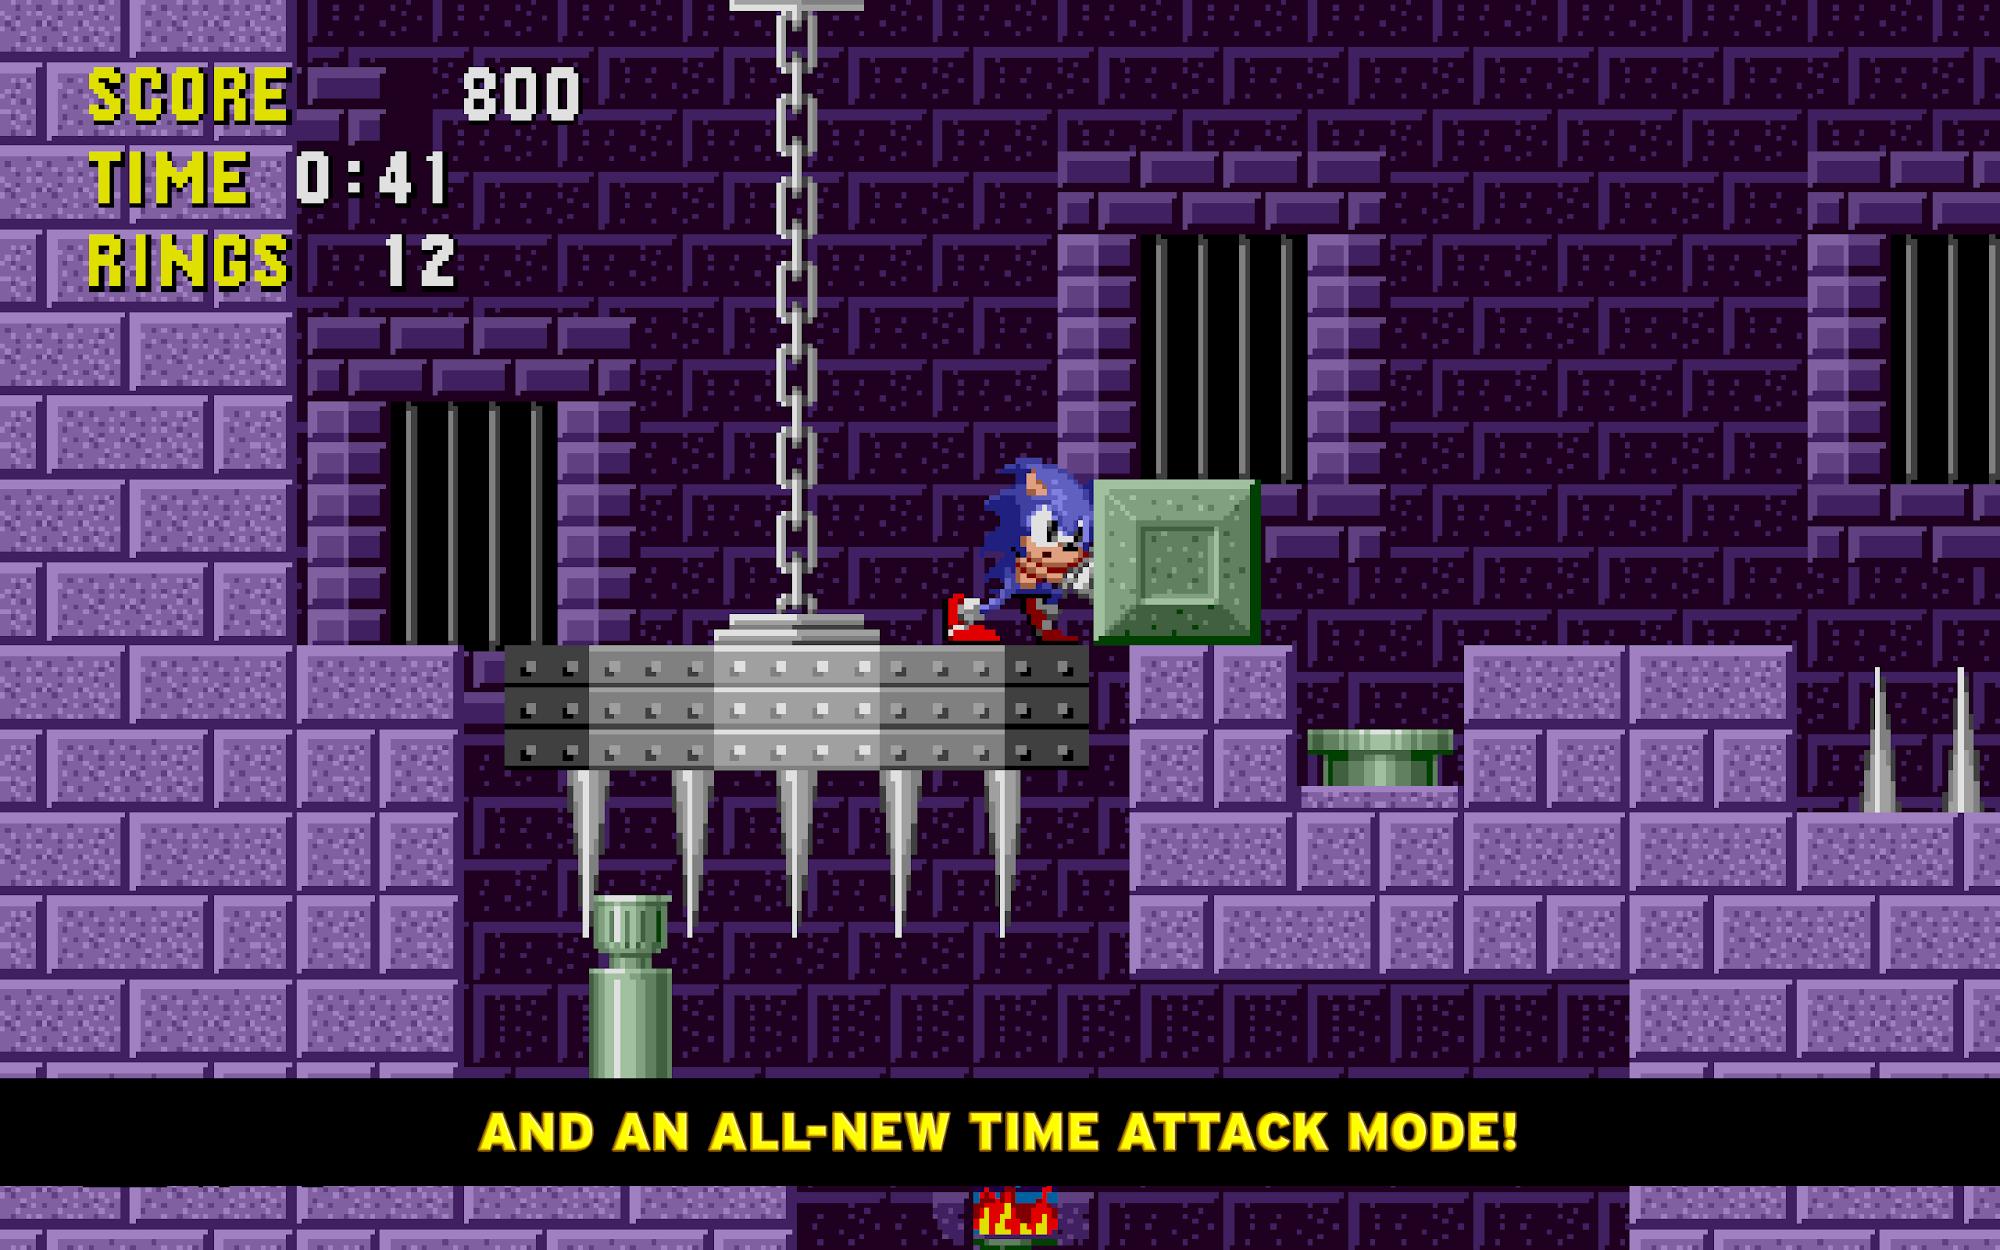 Sonic The Hedgehog screenshot #13